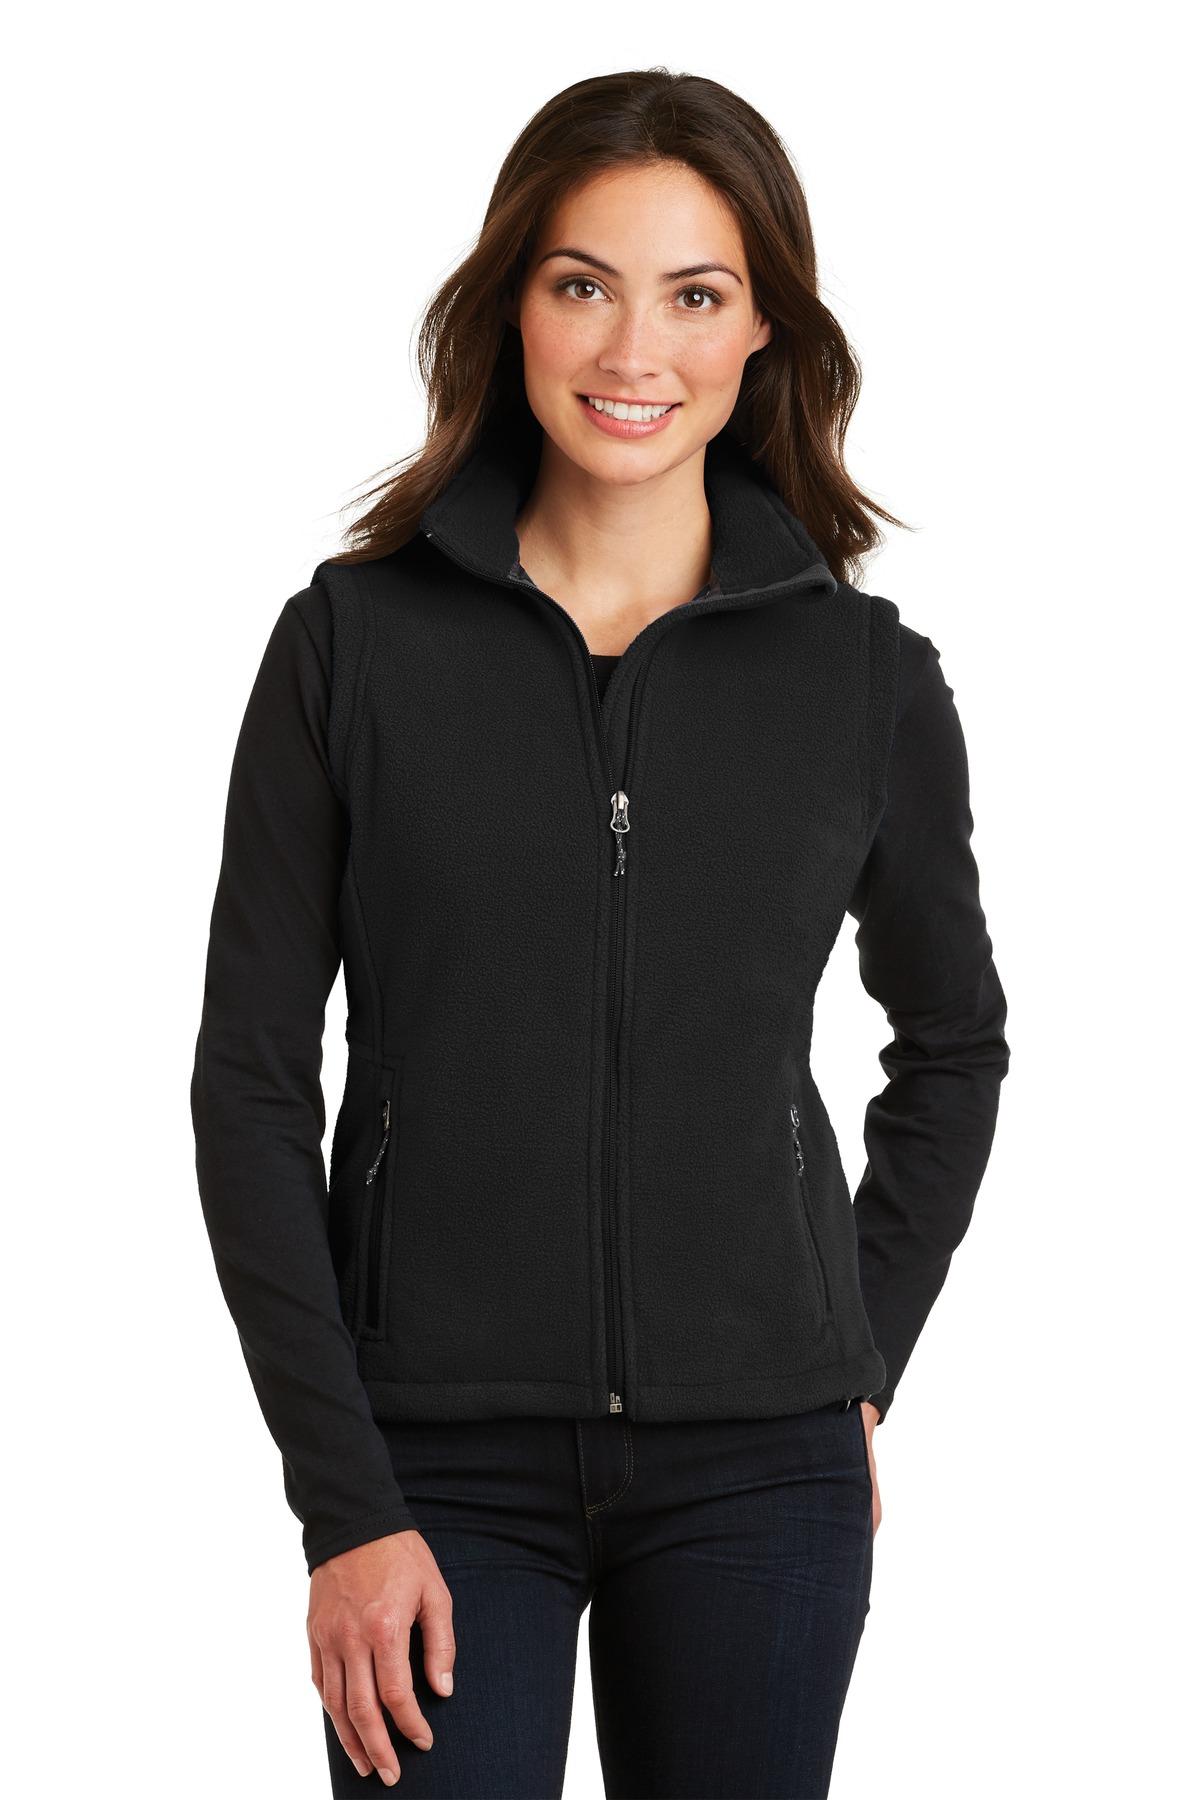 L219 Port Authority® Ladies Value Fleece Vest.-Port Authority